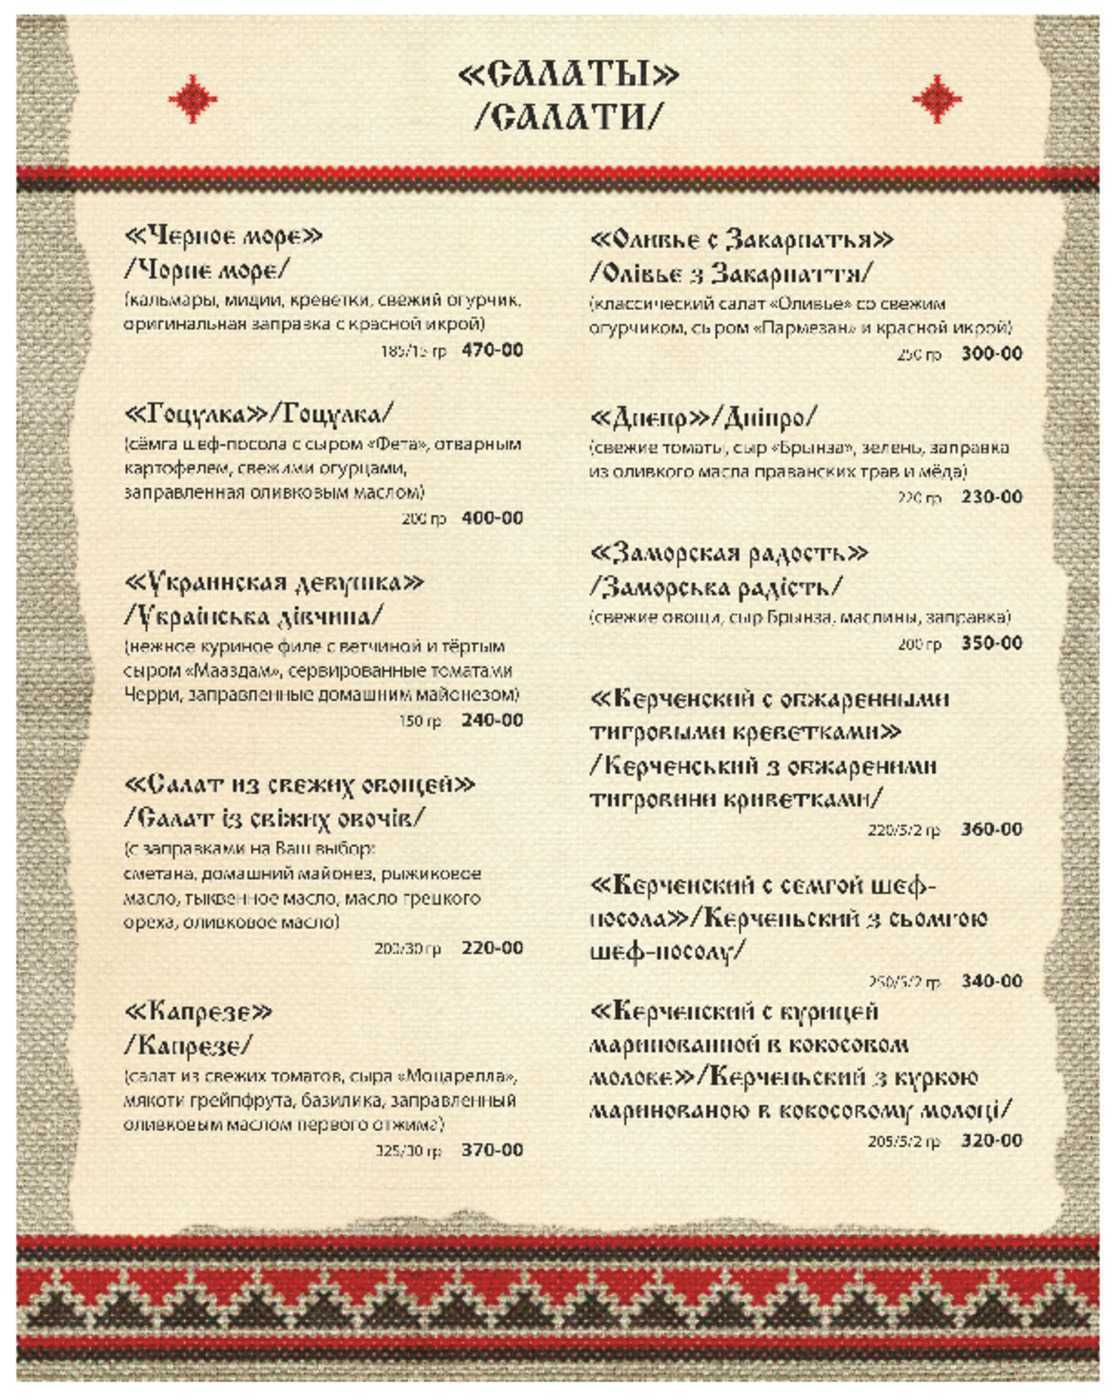 Меню ресторана Вечера на хуторе на улице Александра Логунова